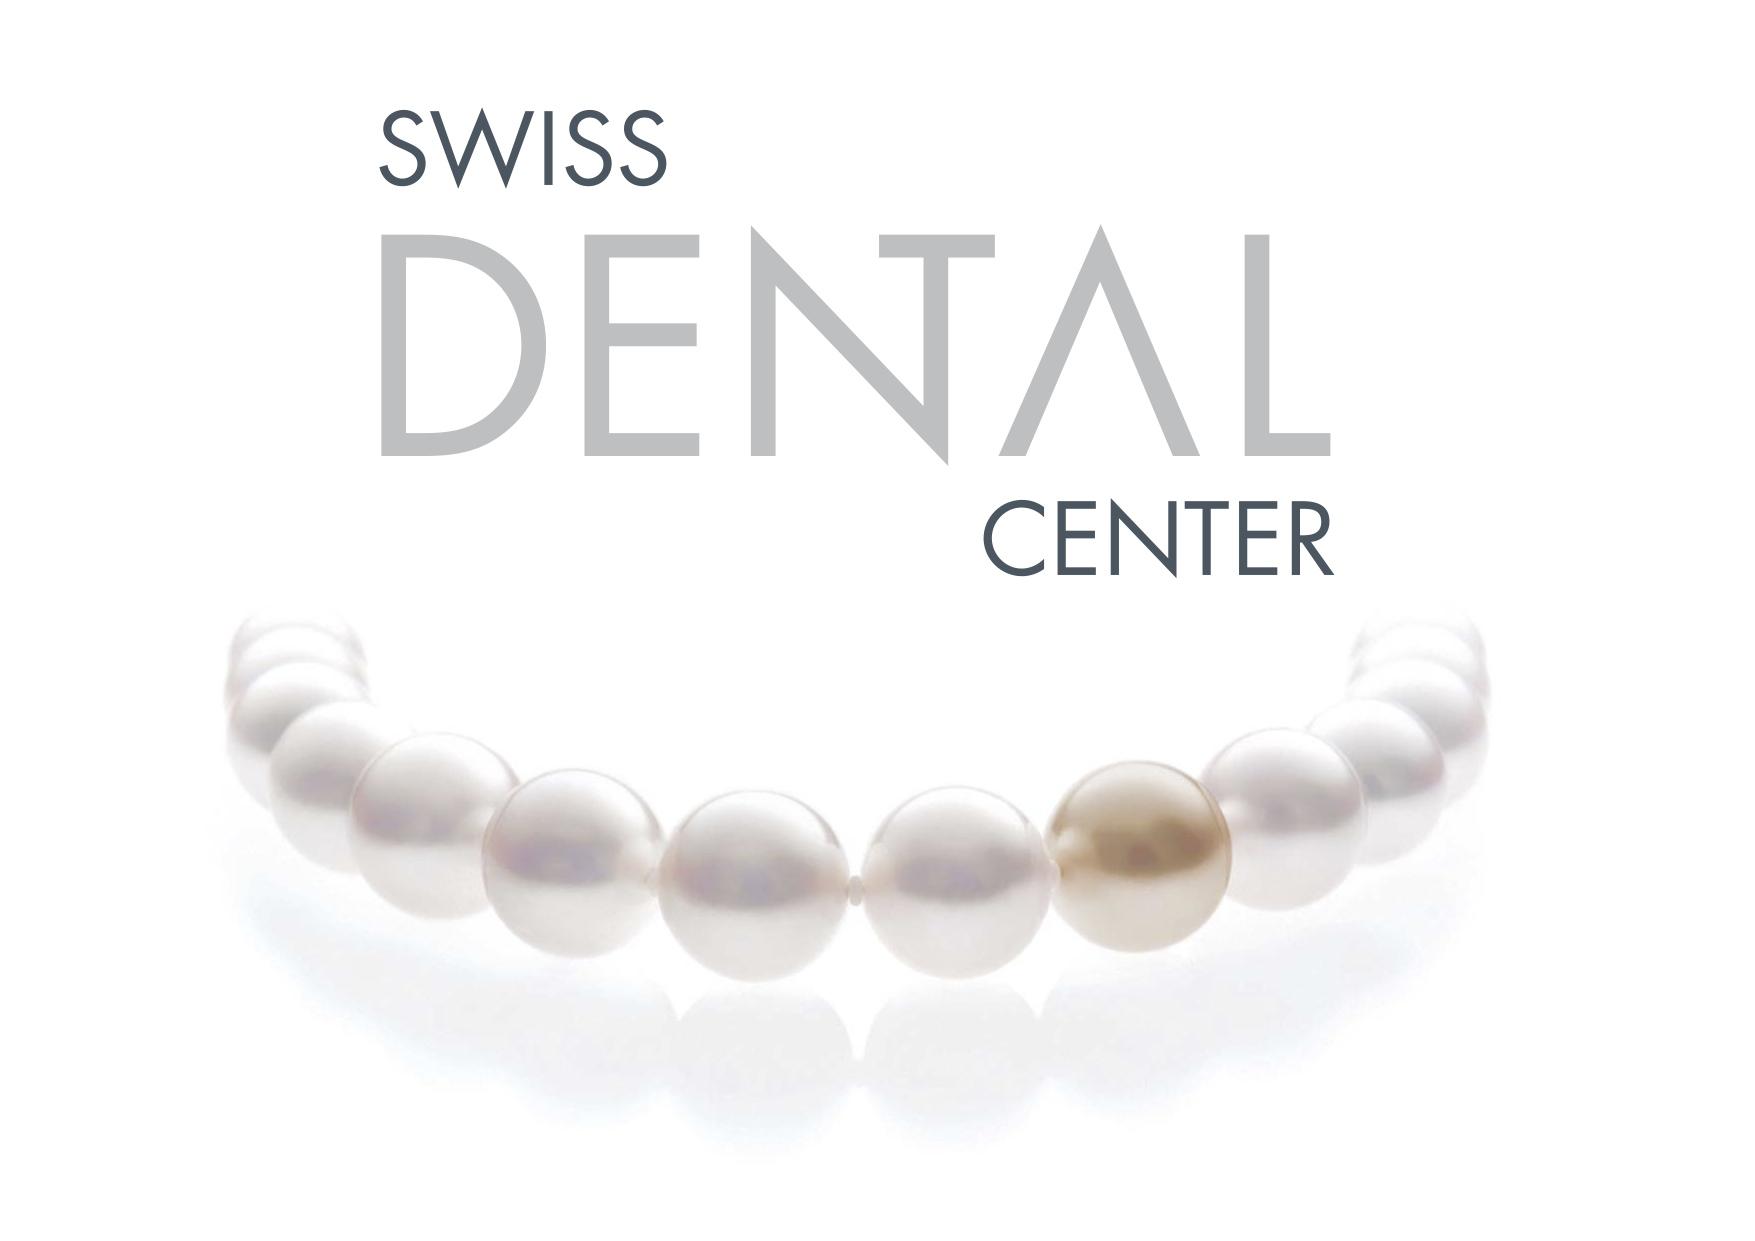 Bilder Swiss Dental Center